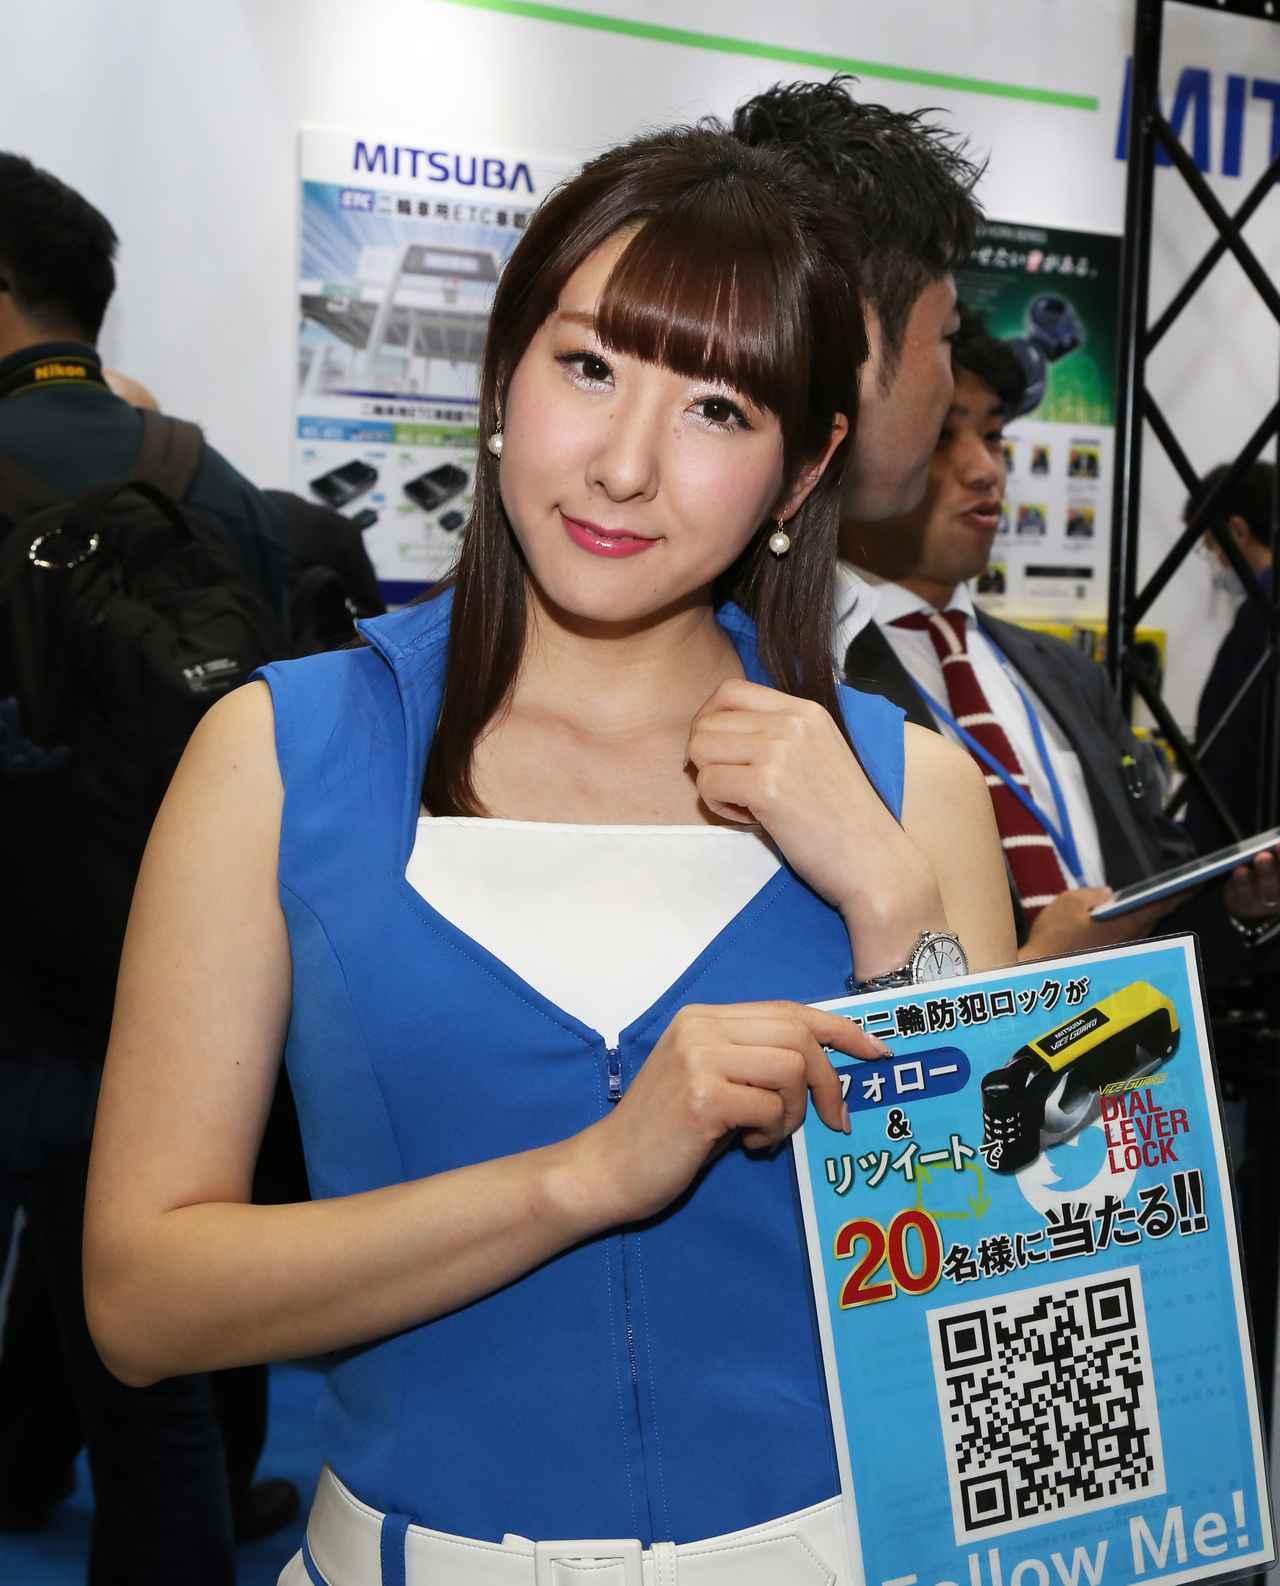 Images : 30番目の画像 - TMCS2019 美女コンパニオン図鑑! - webオートバイ